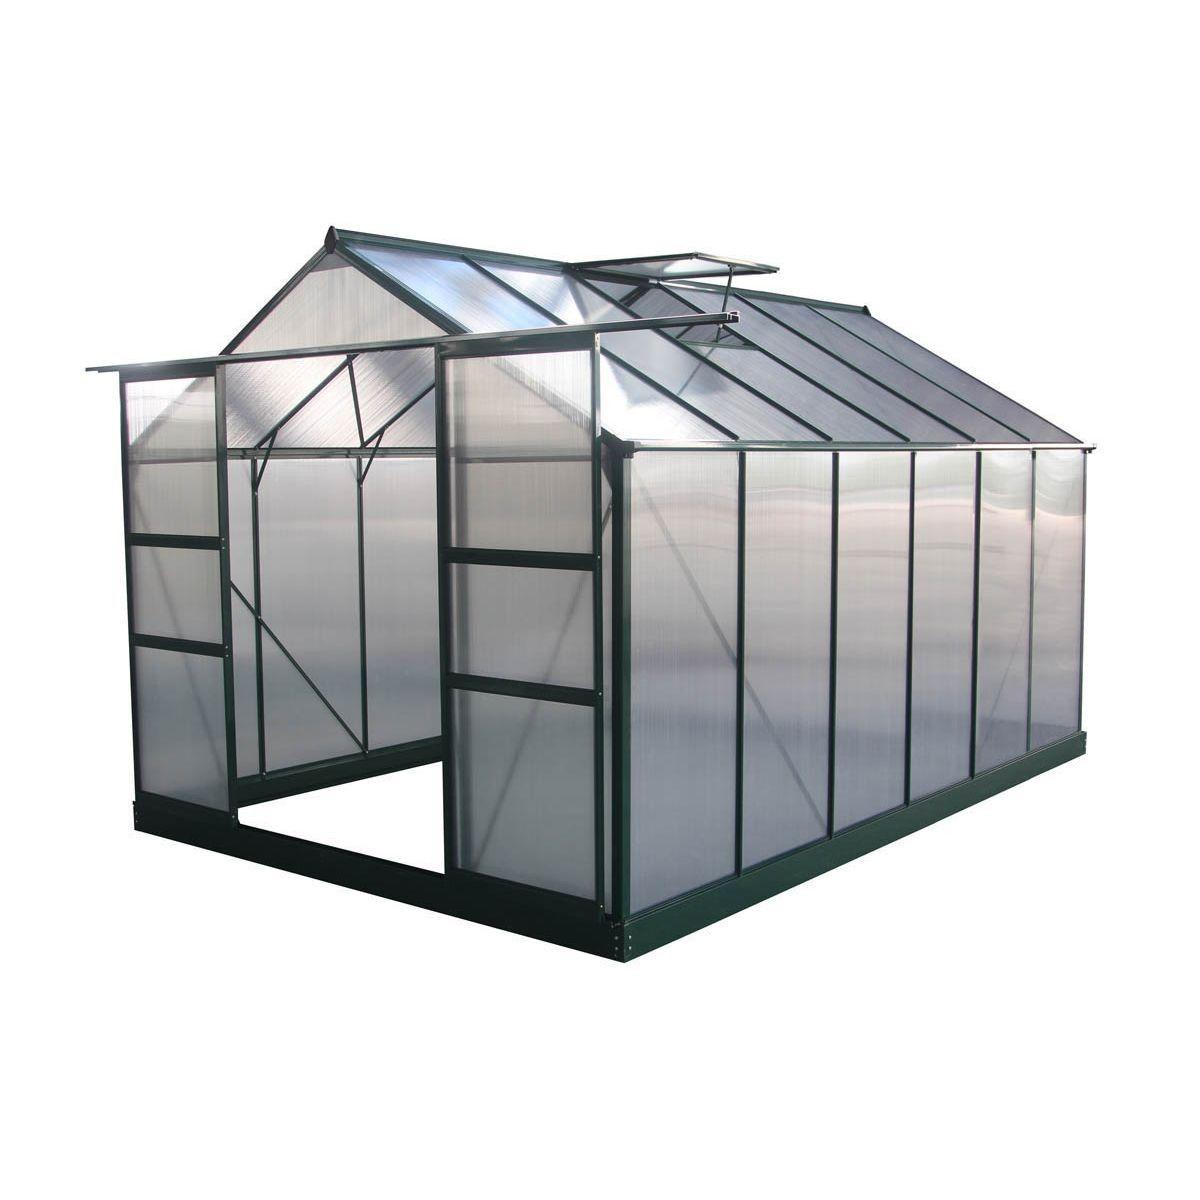 "Serre Jardin Polycarbonate ""dahlia"" Vert Sapin 9,24 M² ... intérieur Serre De Jardin Polycarbonate Pas Cher"